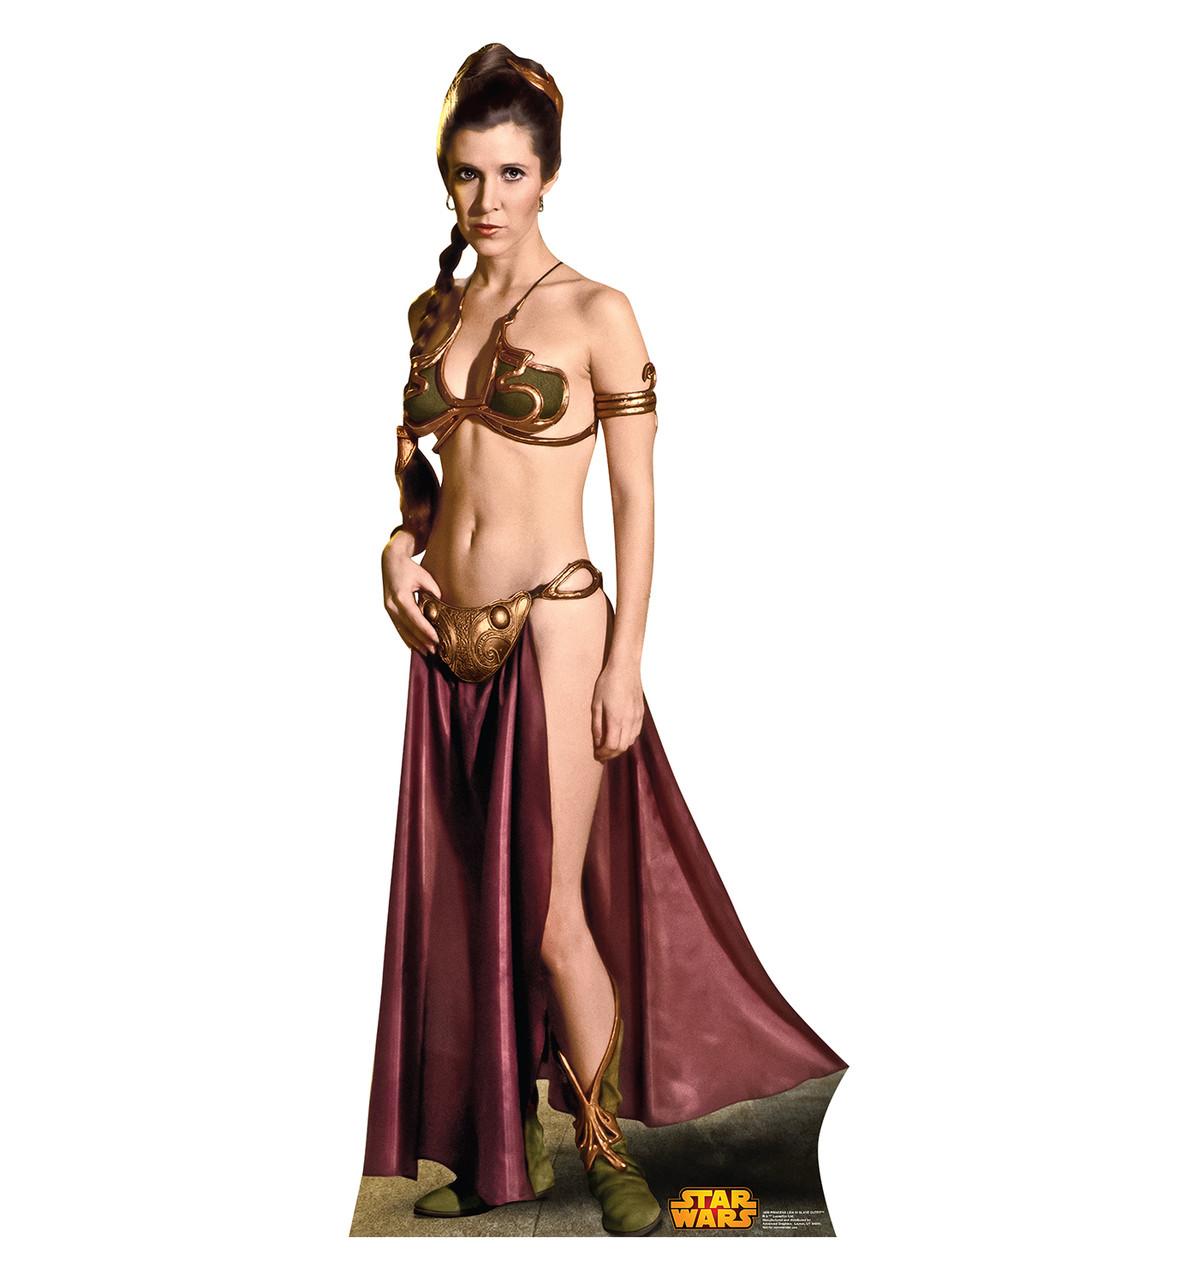 Princess leah slave bikini